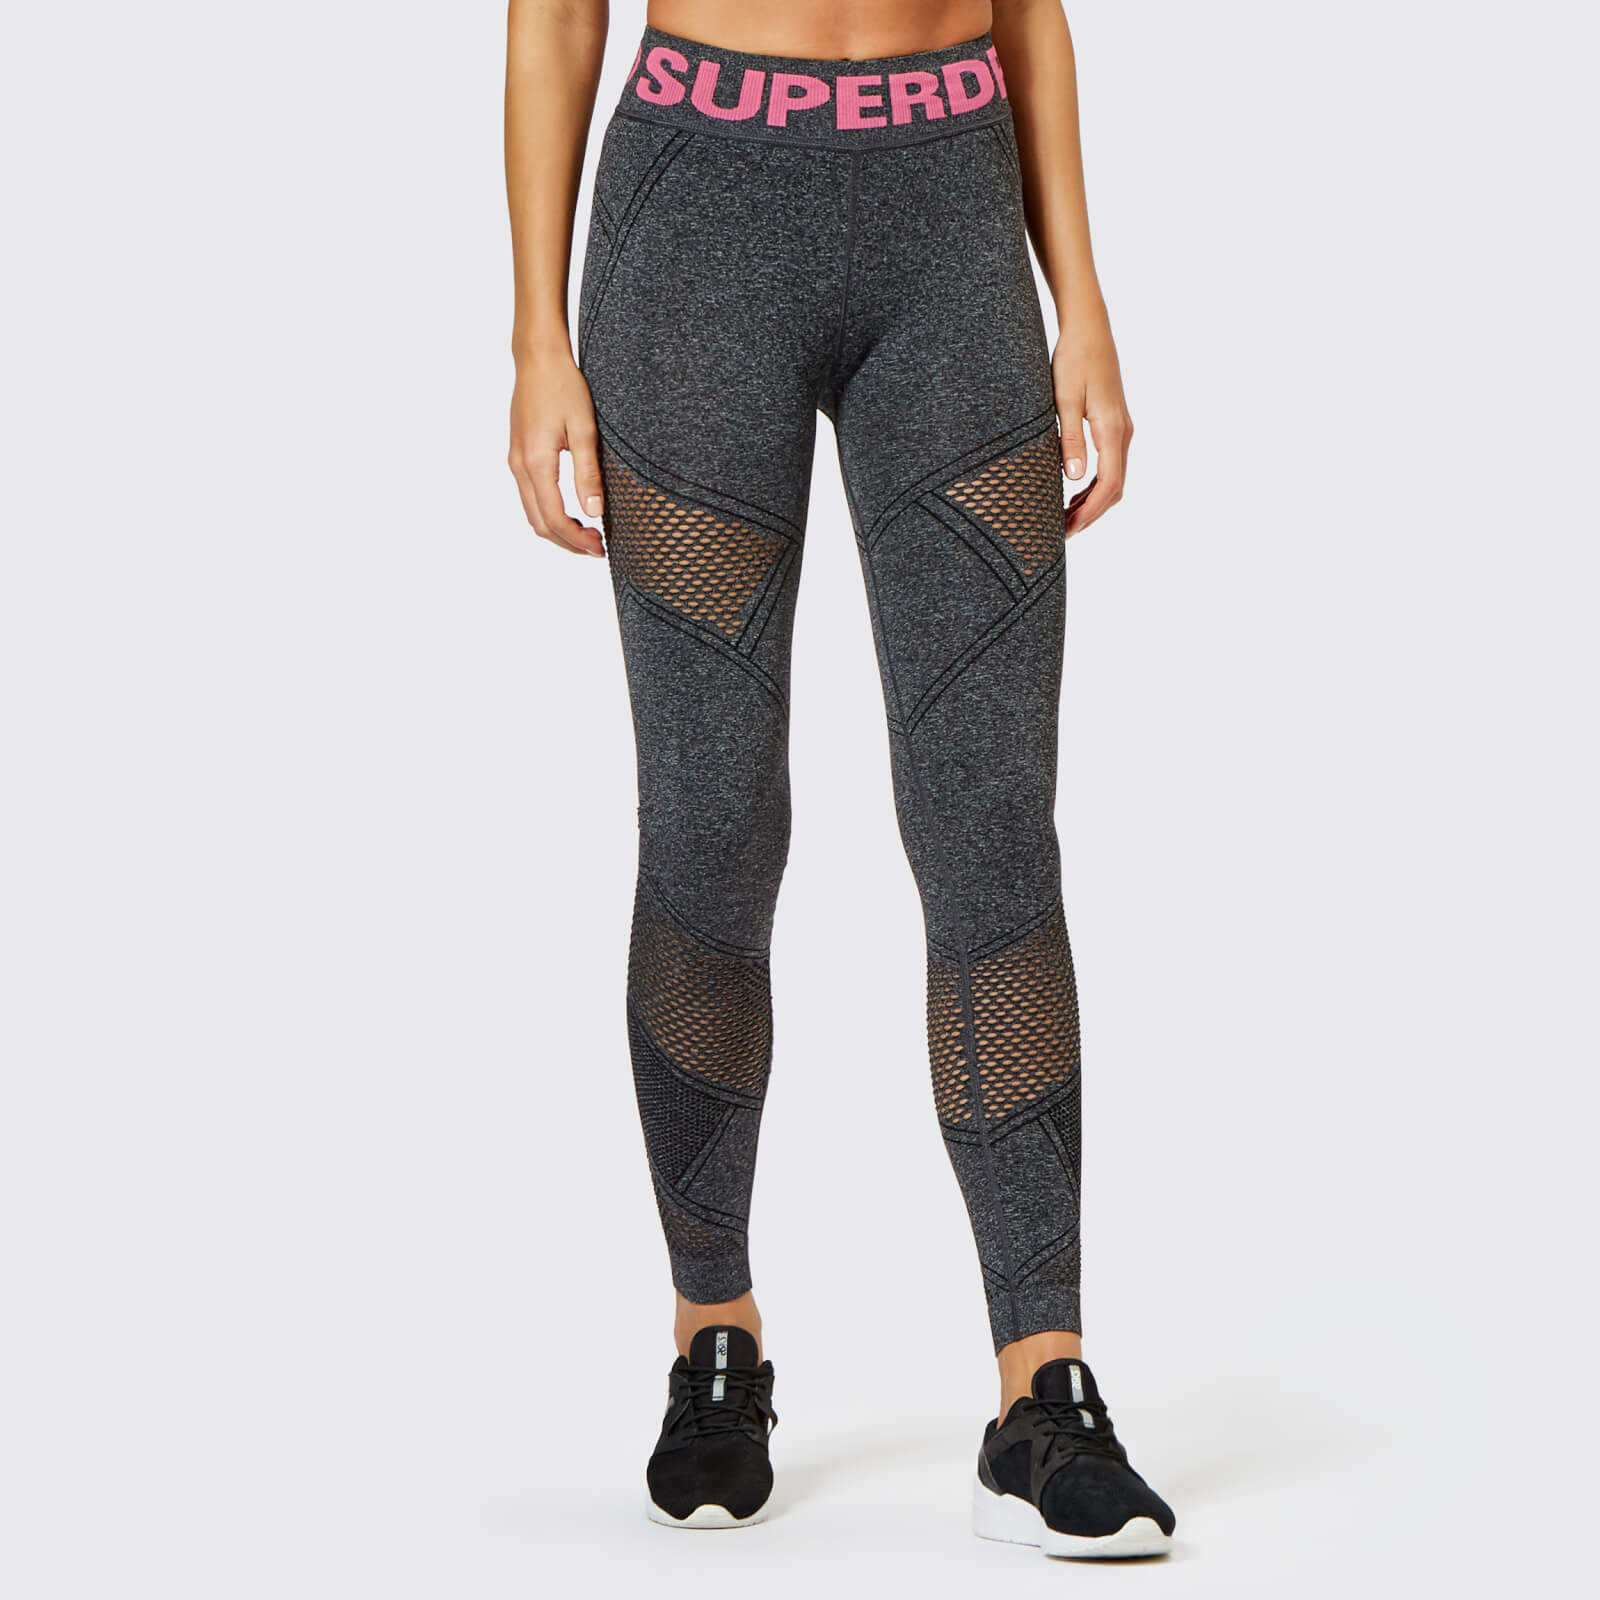 e16ce2830303a2 Superdry Sport Women's Active Seamless Leggings - Black Marl Womens  Clothing | TheHut.com